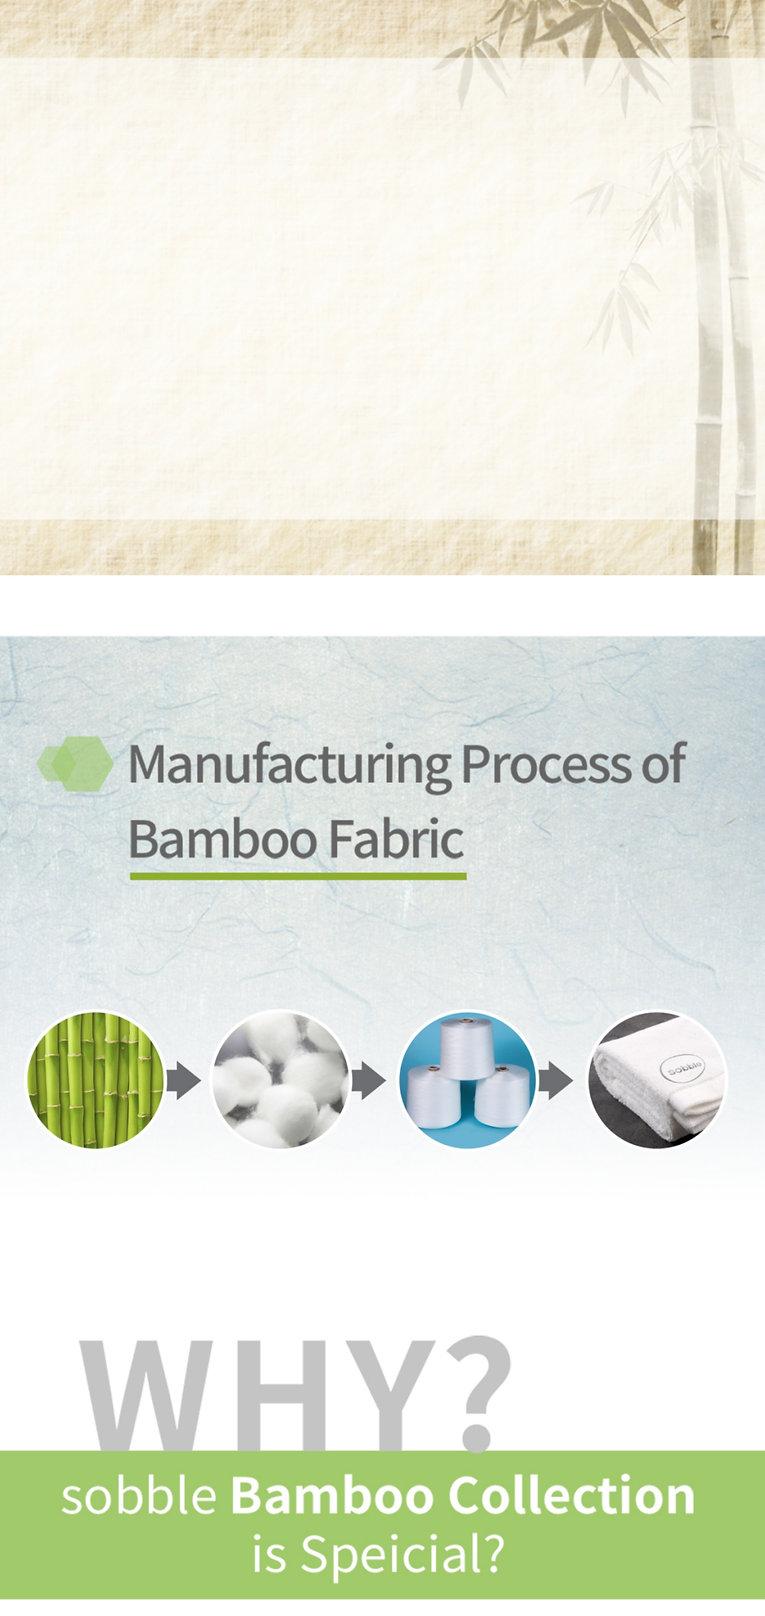 Bamboo robe draft 3.jpg